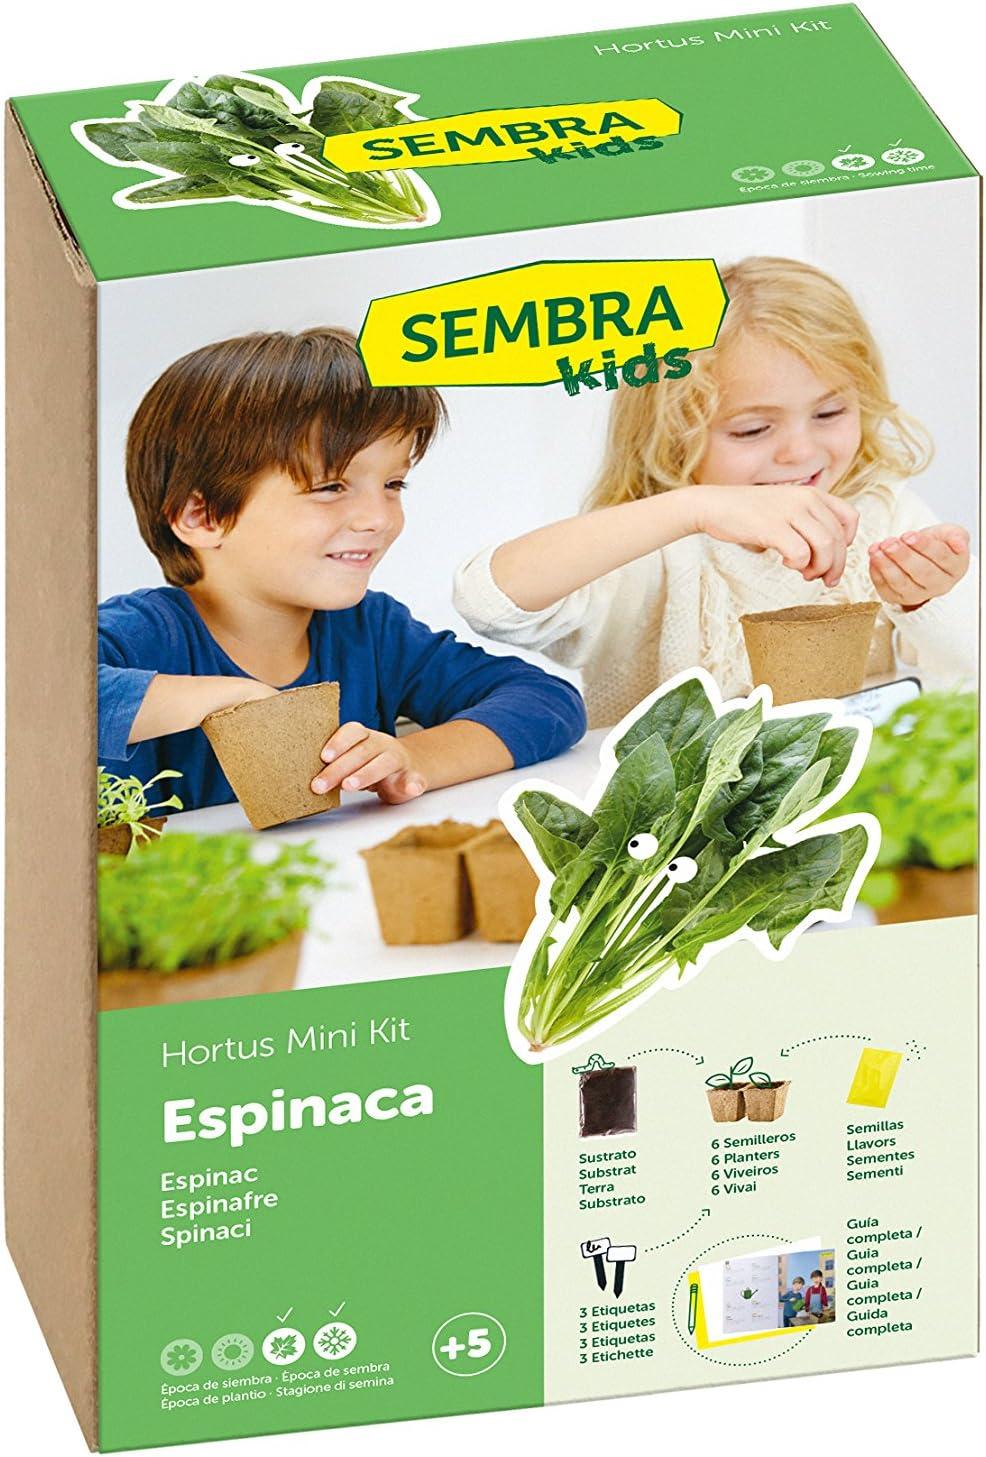 SEMBRA - juego educativo, Kit huerto Espinaca